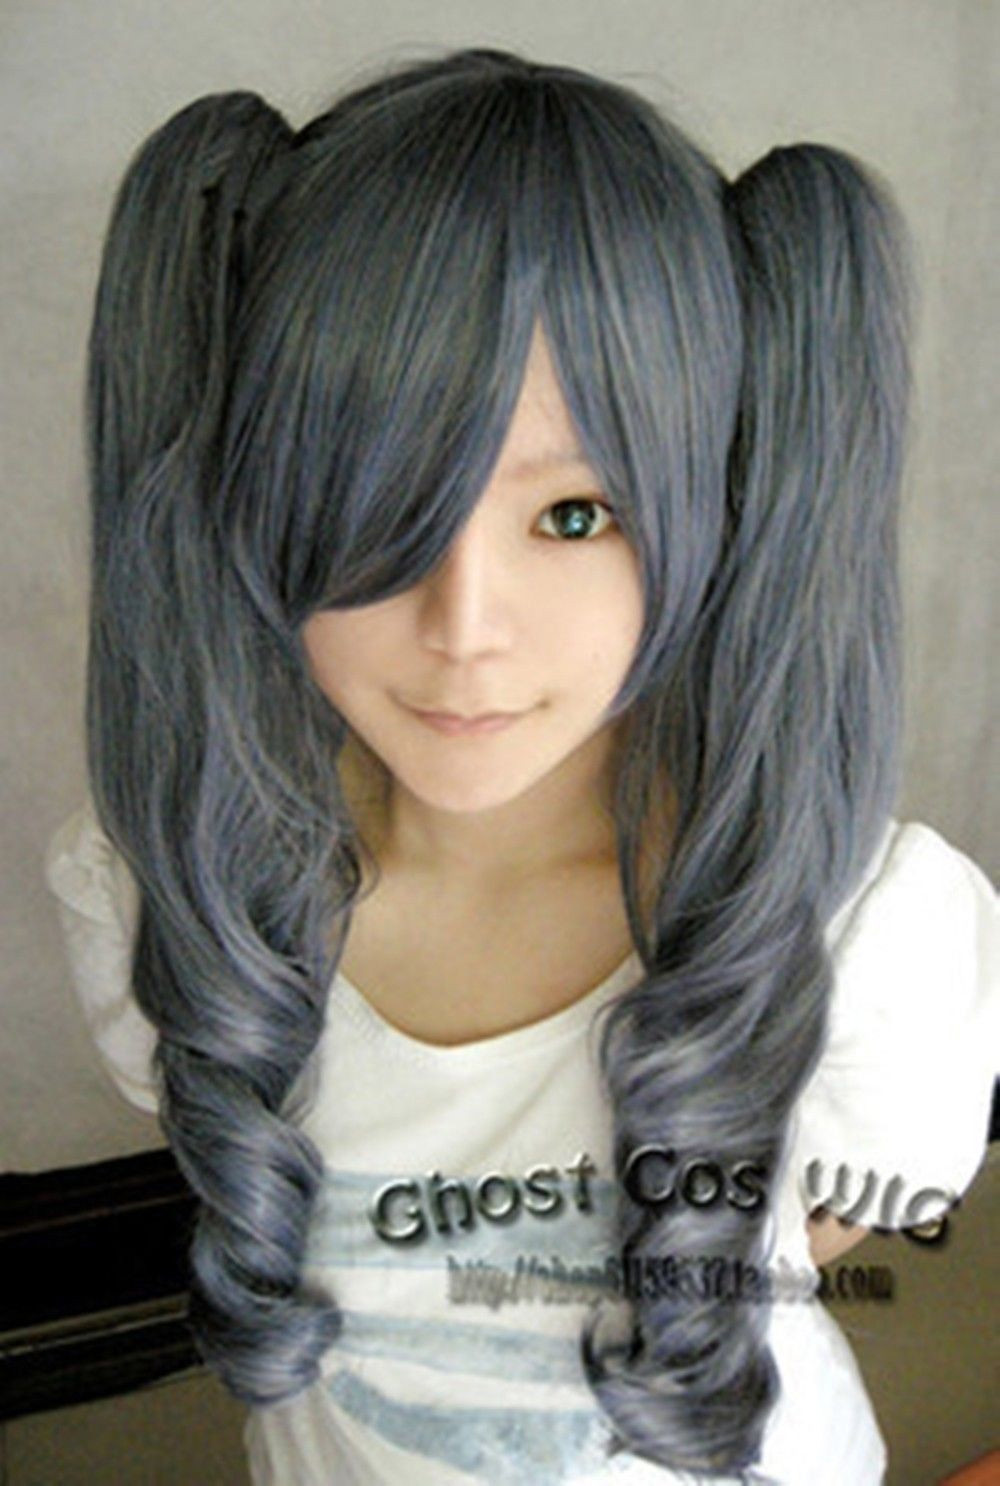 Contemplative Free Ship>>> Black Butler Kuroshitsuji Ciel Phantomhive Girl Ver Blue Mix Grey Cosplay Wig In Pain